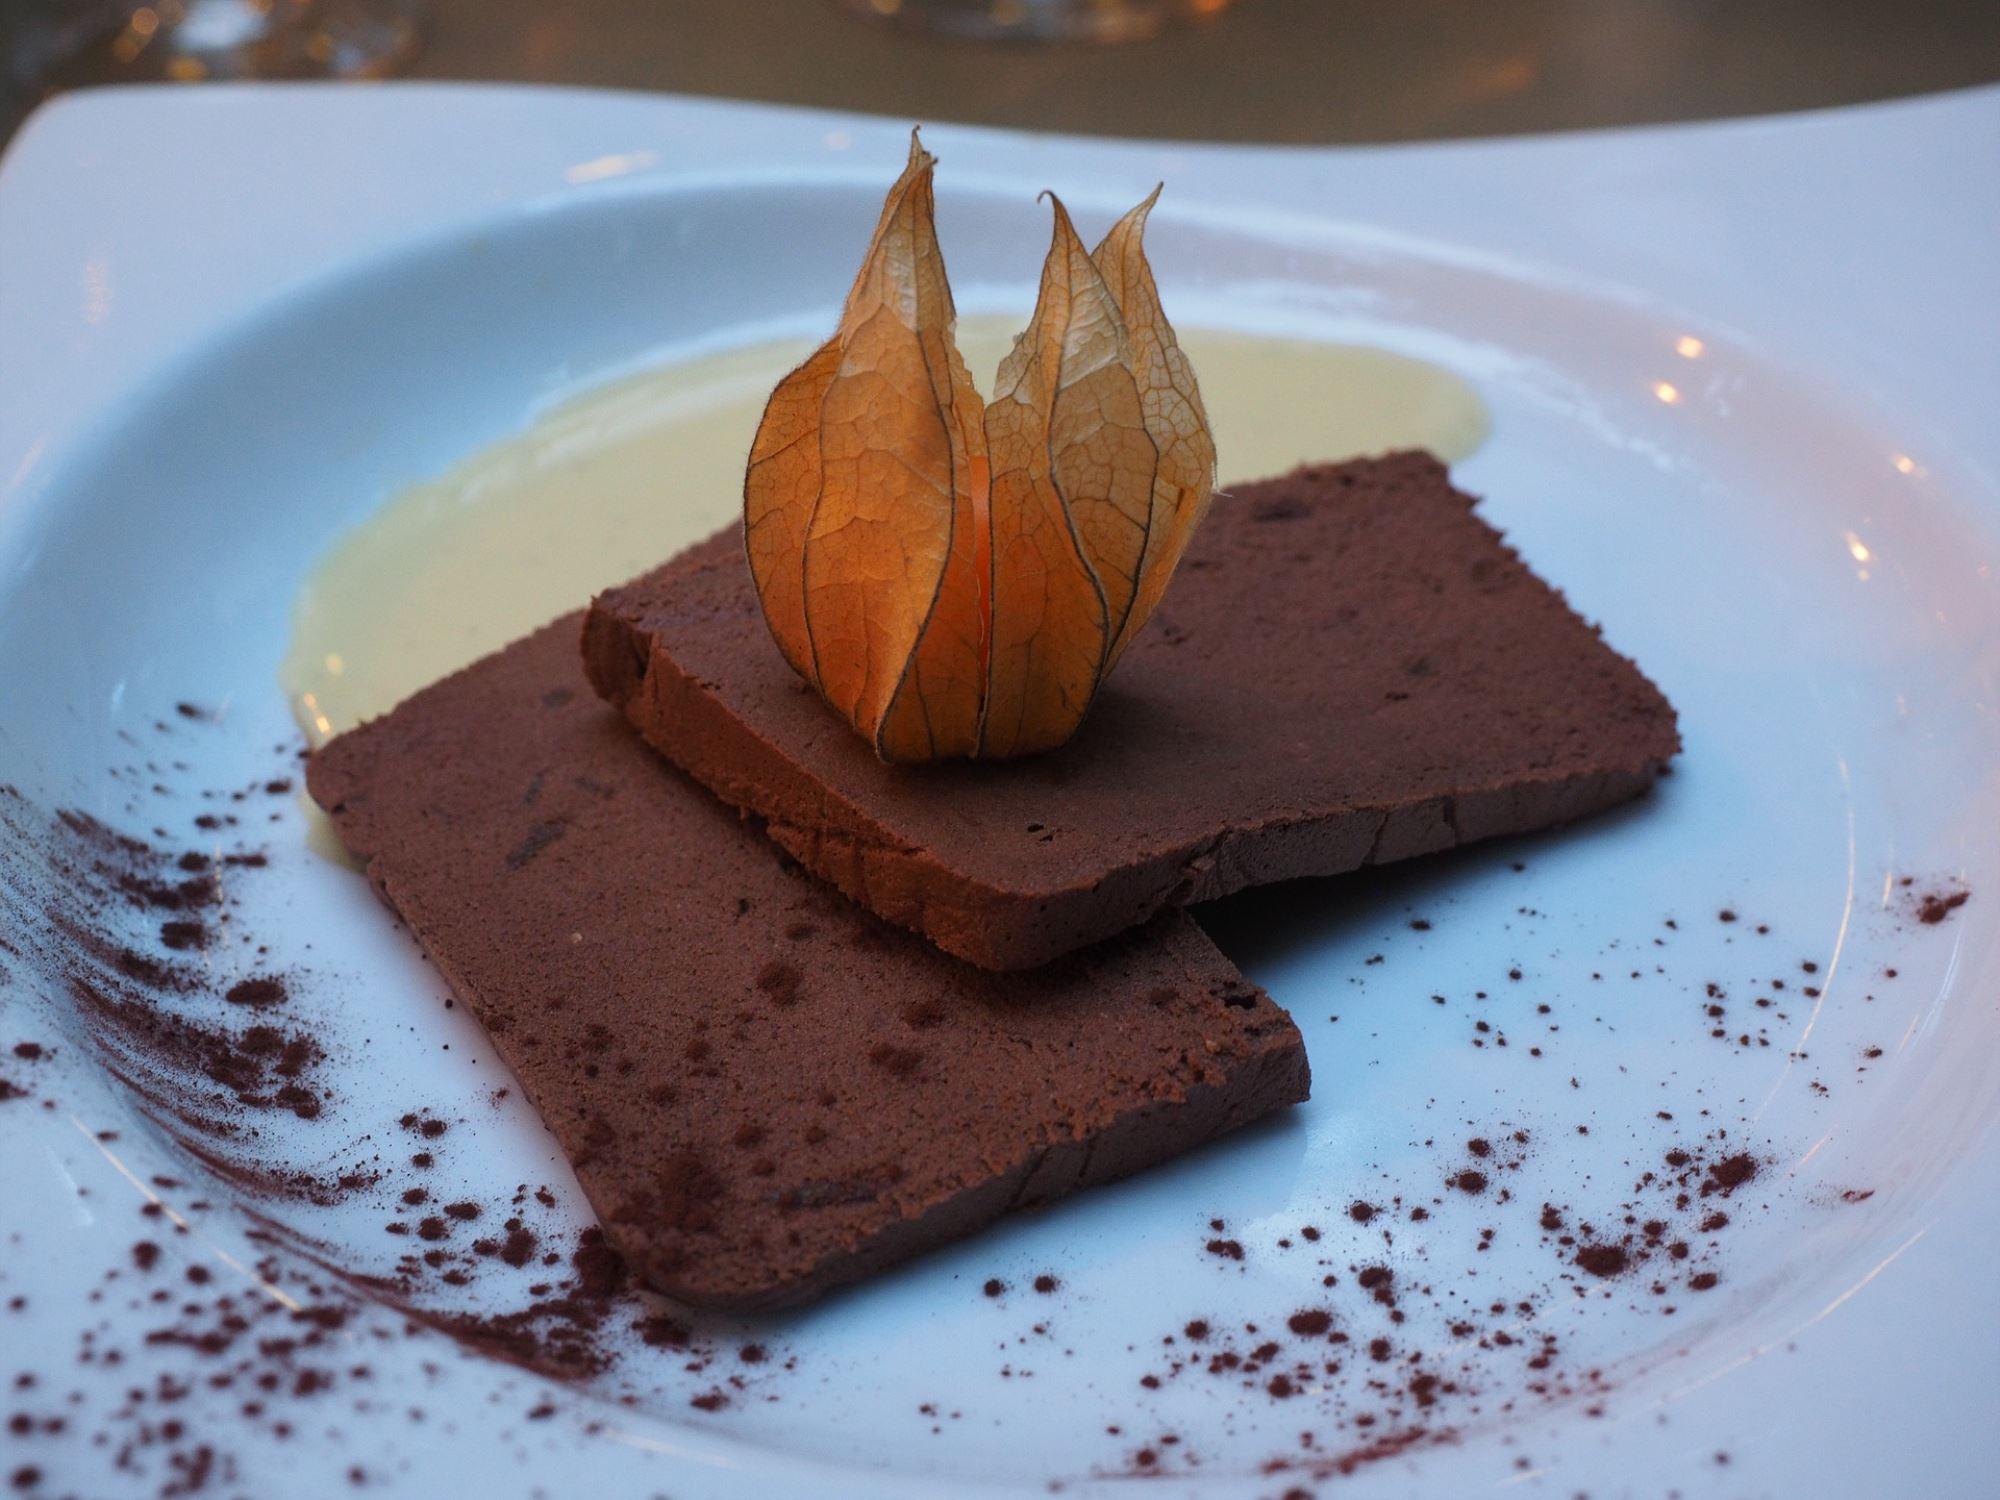 Chokoladeparfait med cacaopulver